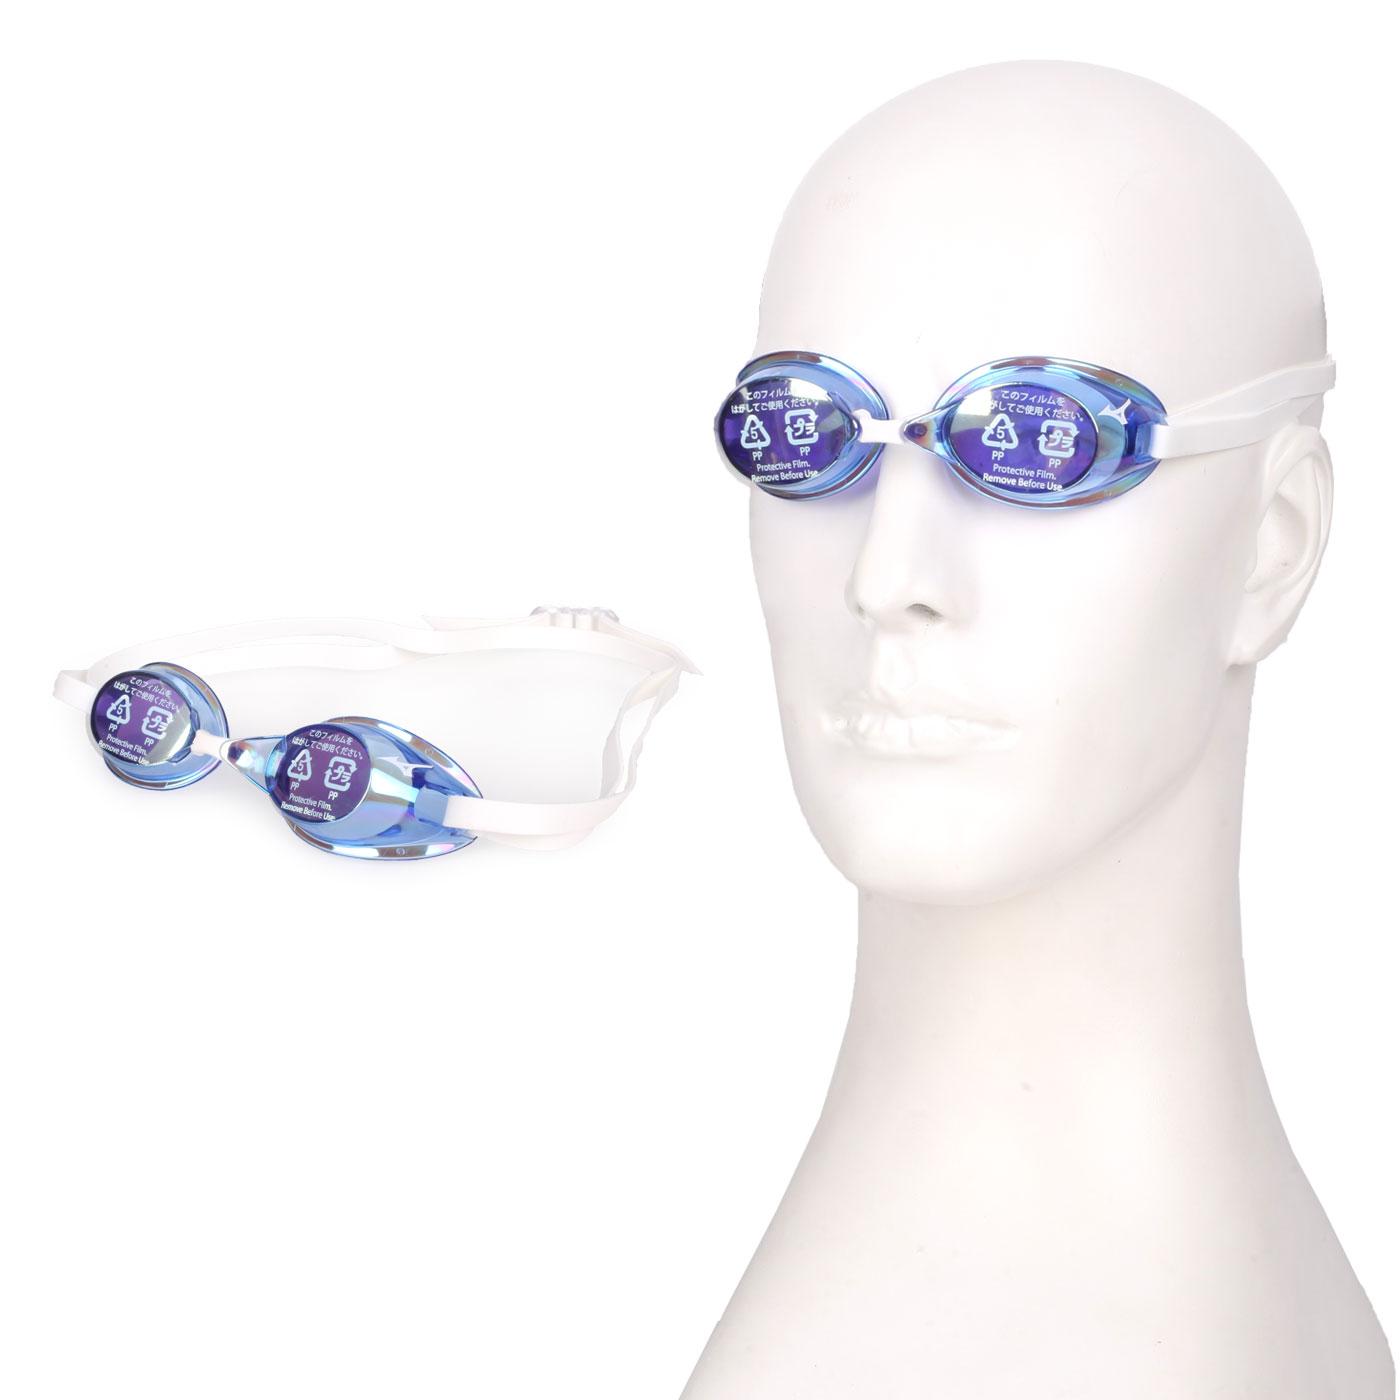 MIZUNO 日製競速型無墊片鍍膜泳鏡  SWIM85YA-75100-21 - 白藍